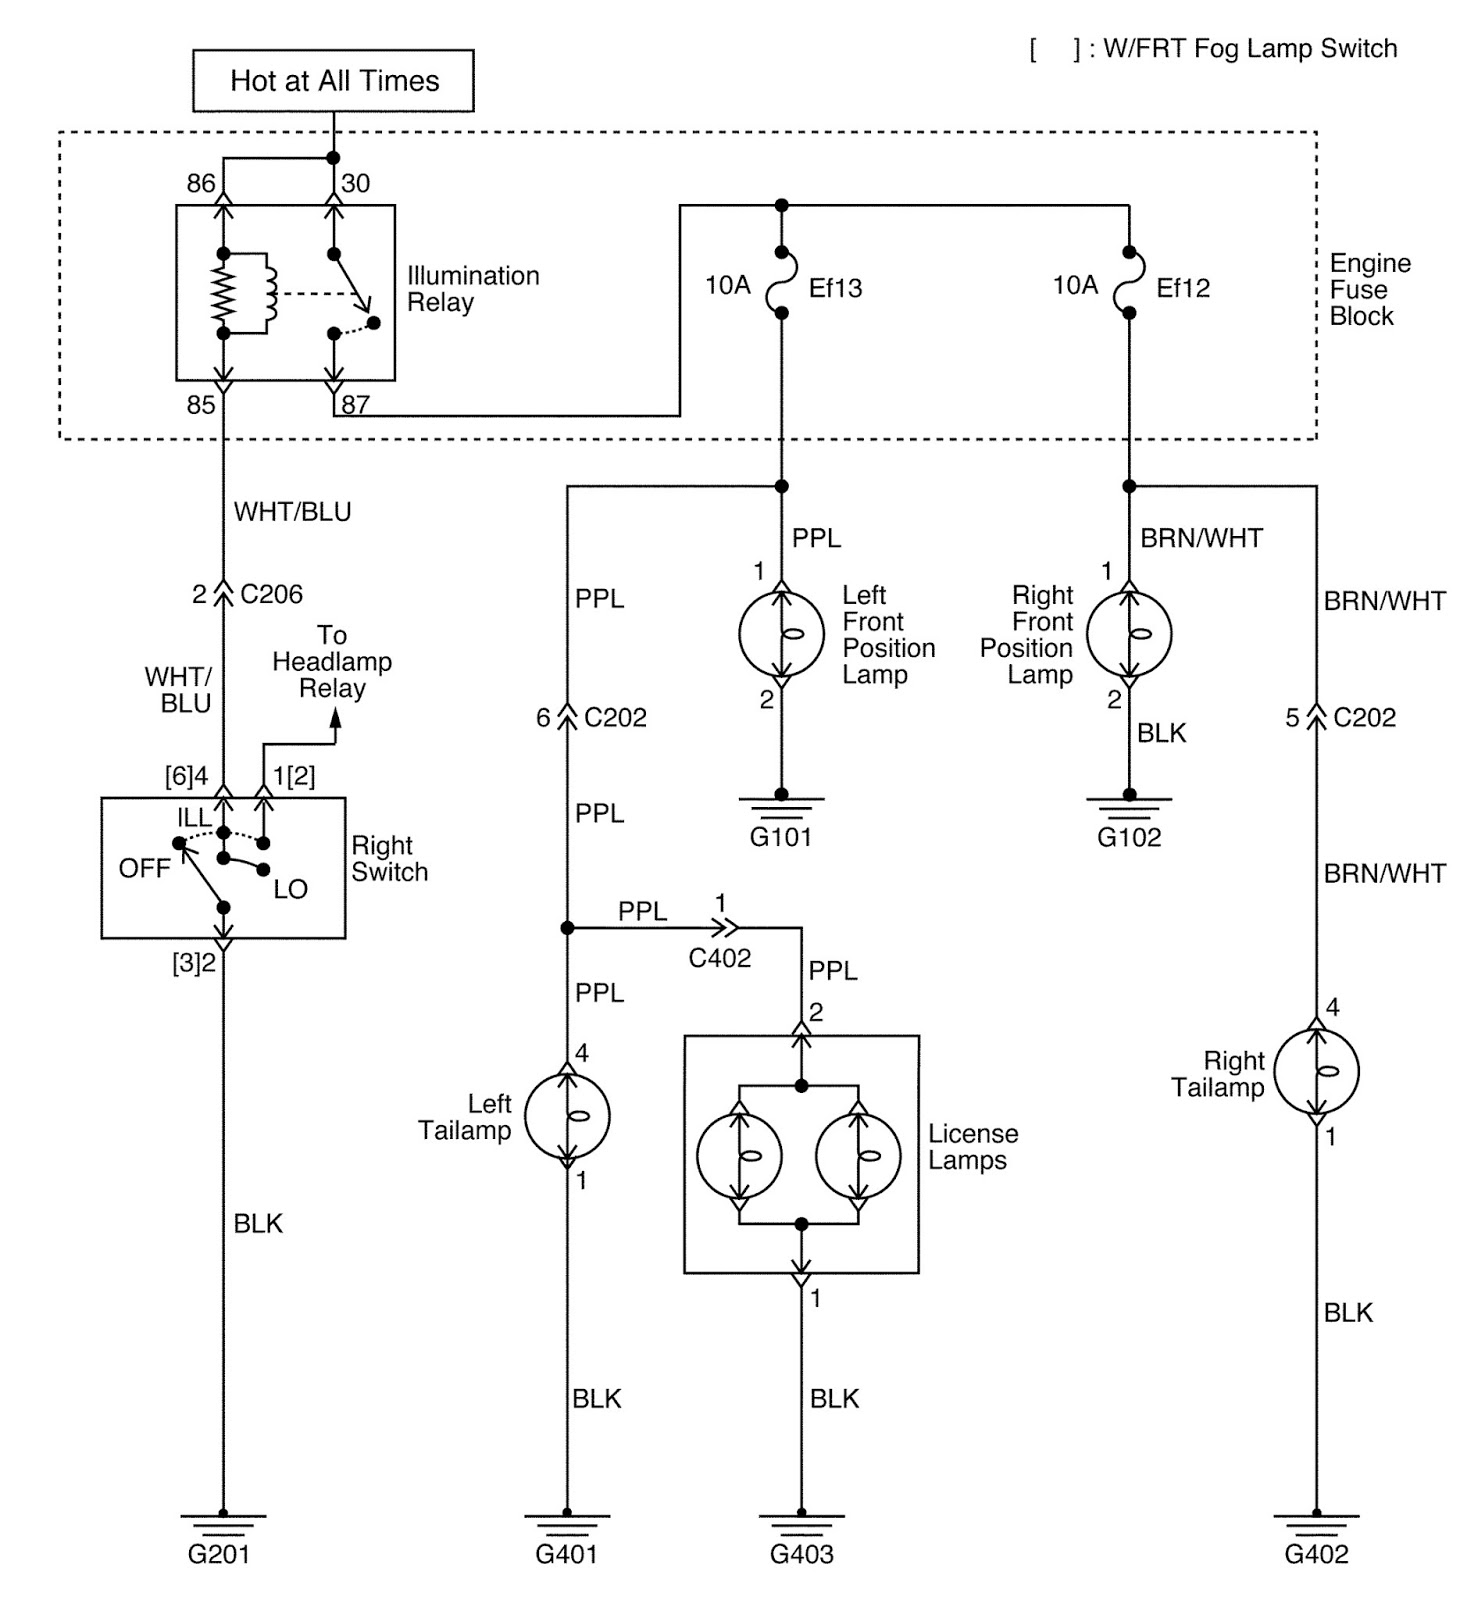 daewoo matiz circuit diagram block and schematic diagrams u2022 2001 daewoo nubira parts wiring diagram [ 1460 x 1600 Pixel ]